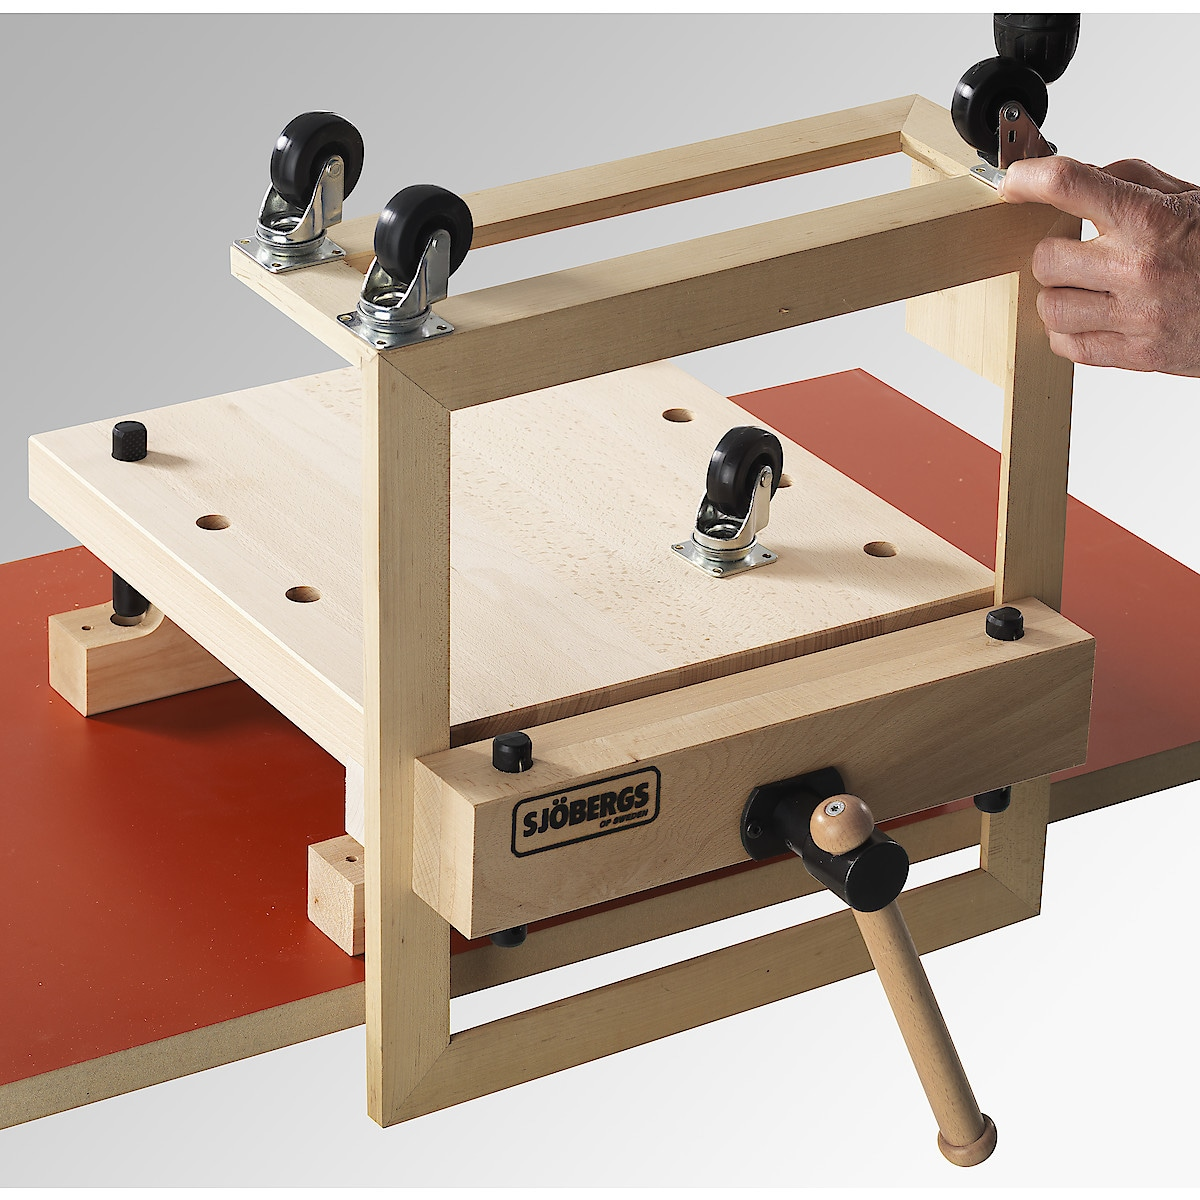 Arbetsbänk Smart Workstation Pro